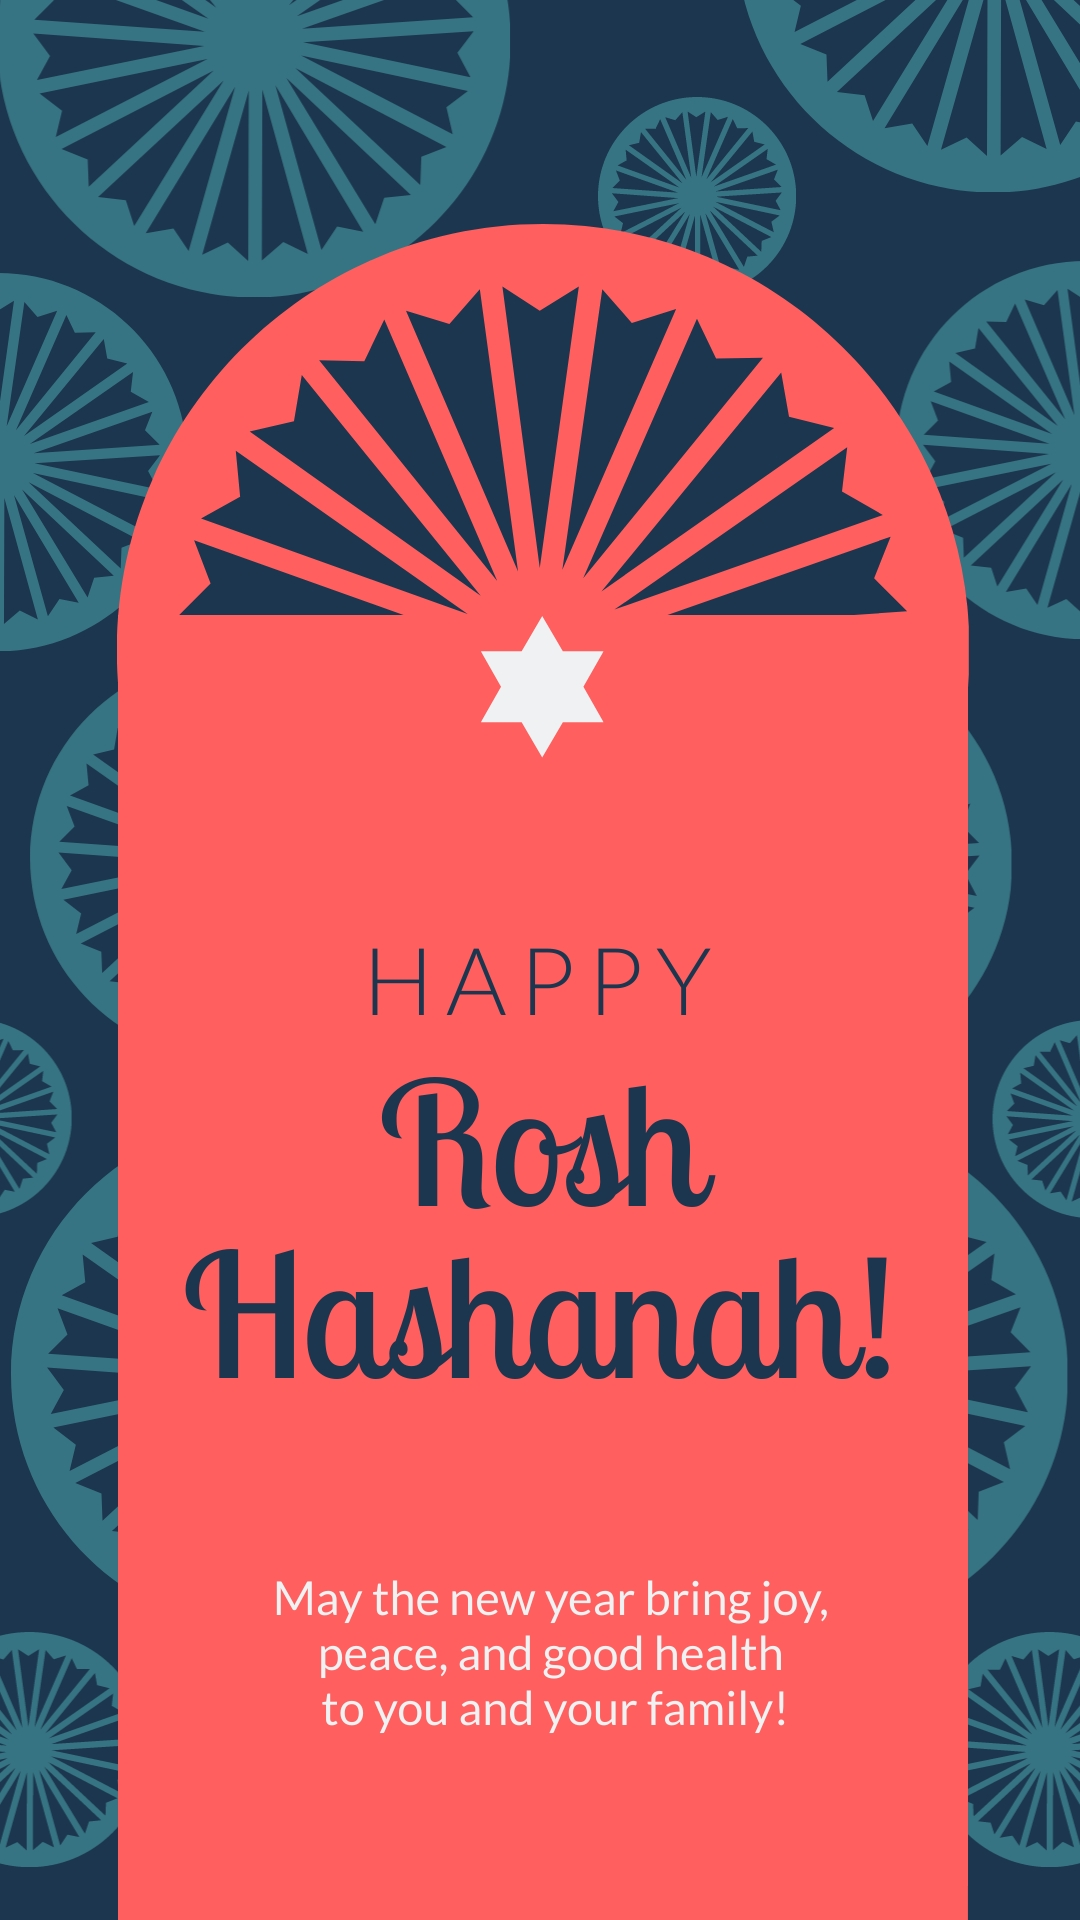 Rosh Hashanah Greeting Animated Vertical Template